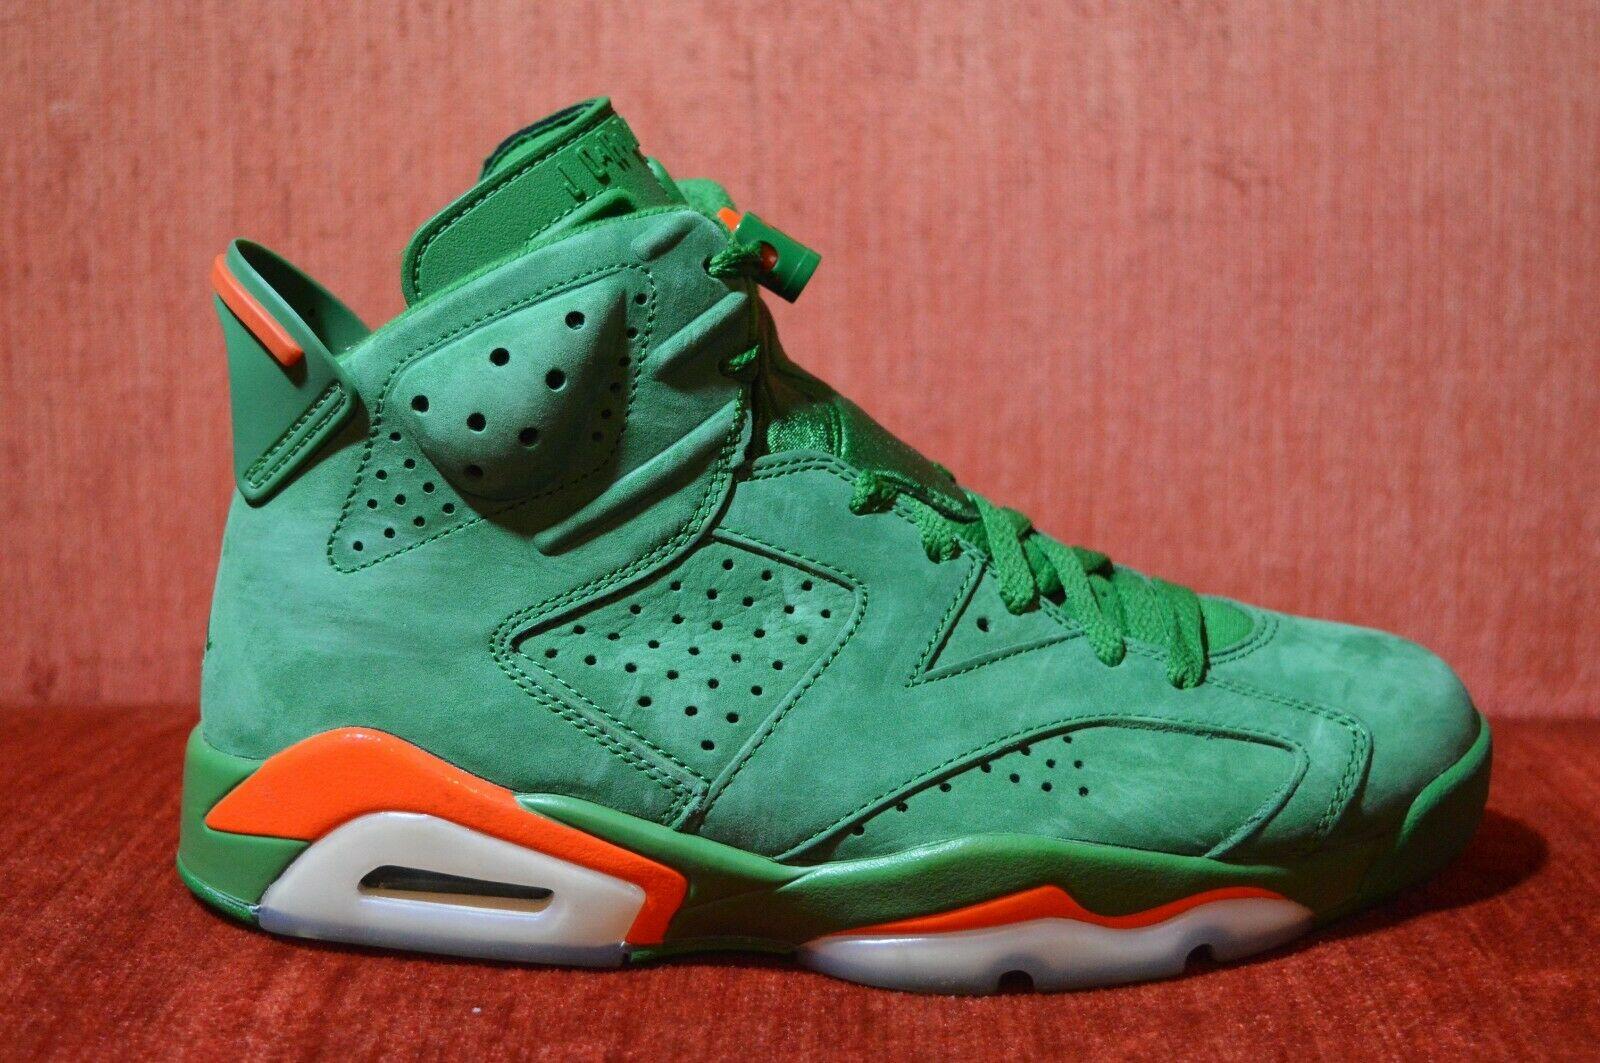 Jordan 6 Retro Gatorade Green